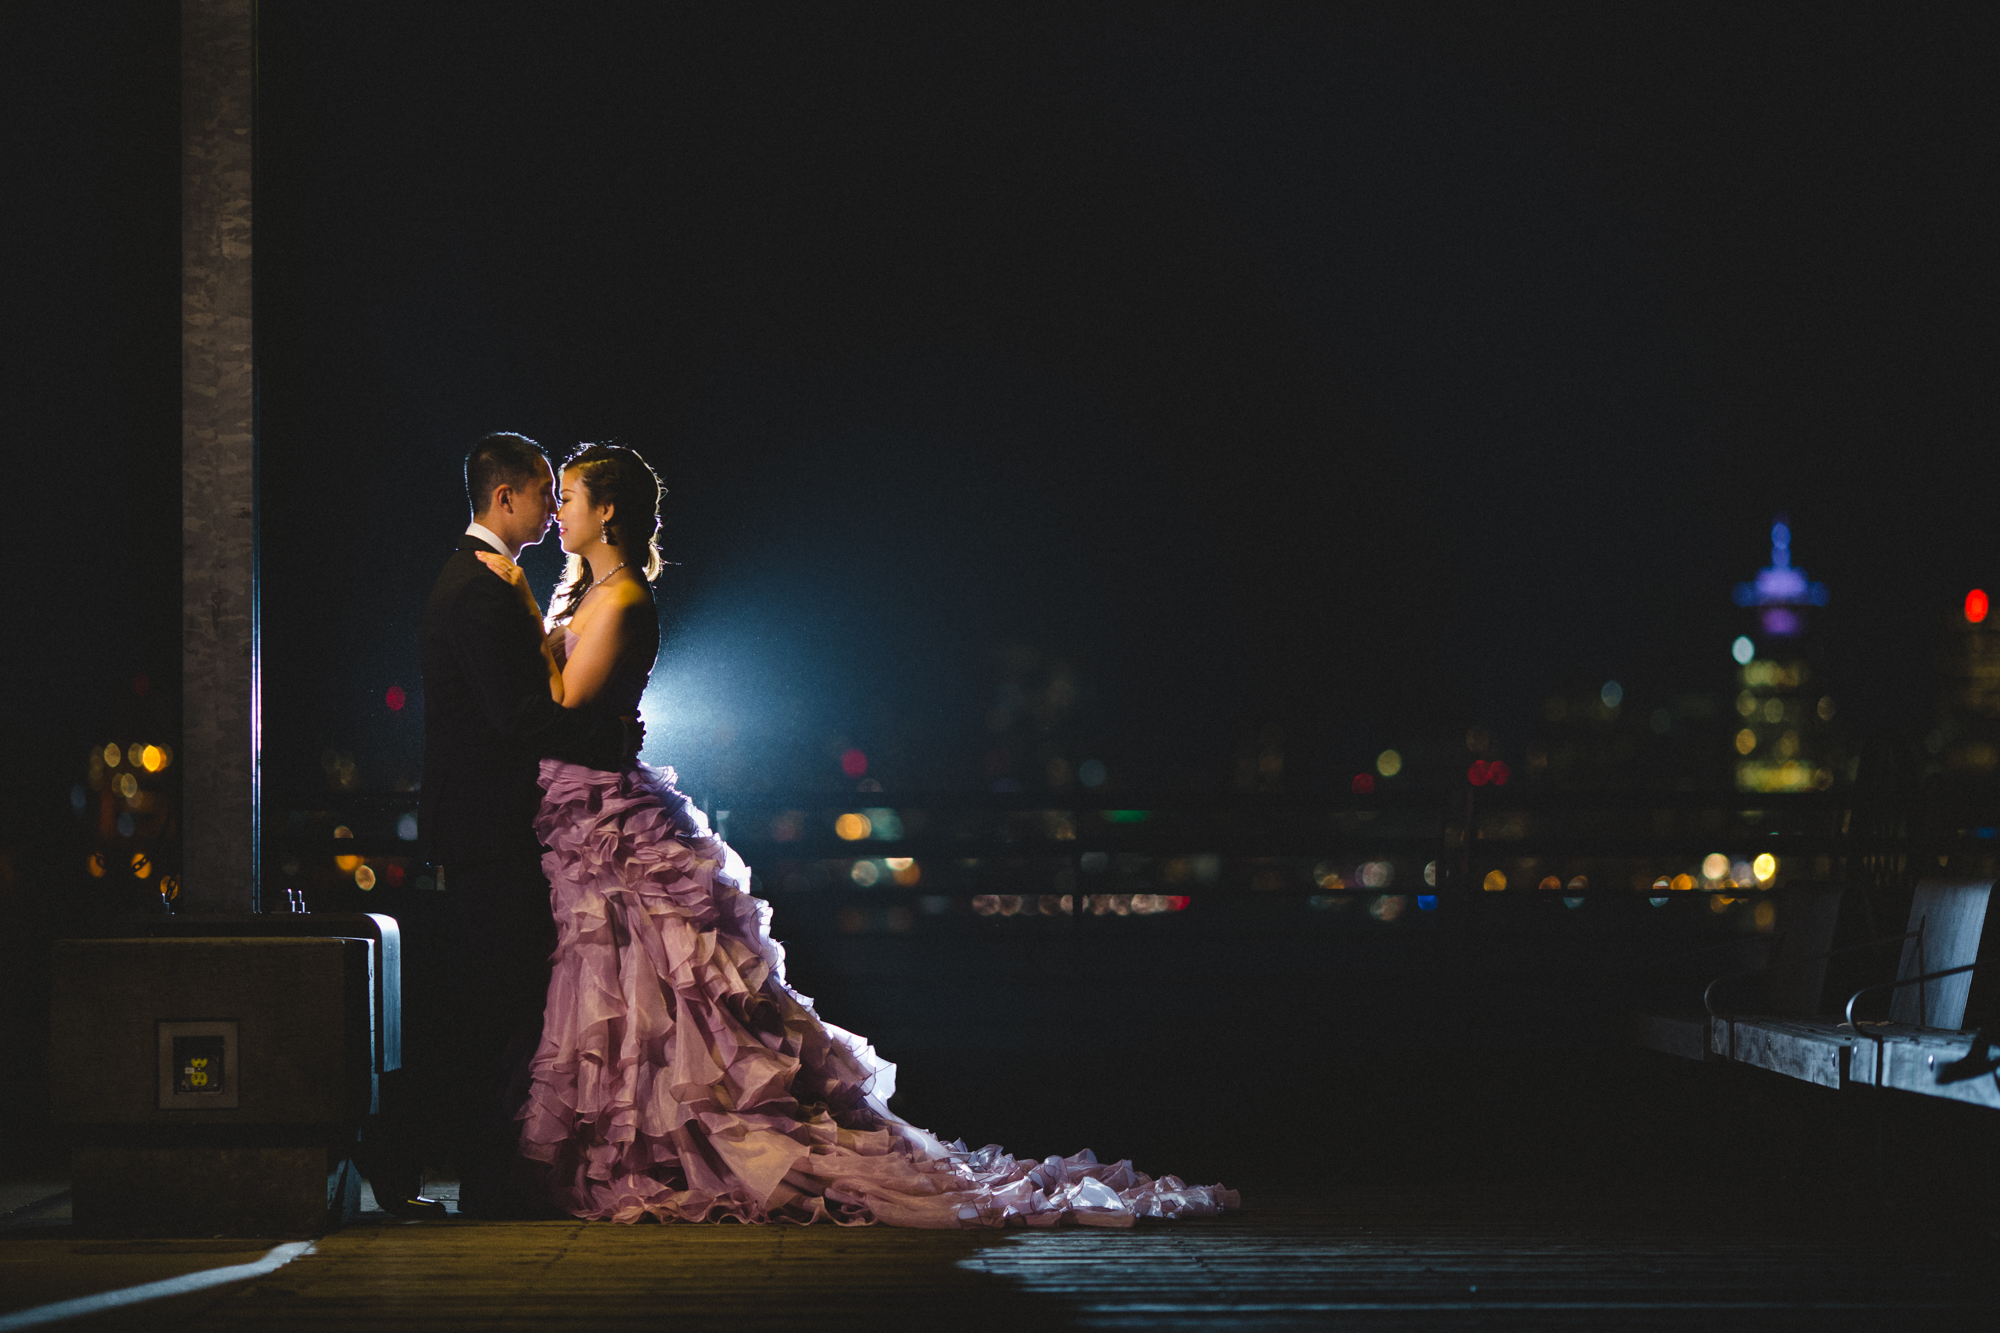 2017may6-FionaAnthonyPrewedding-Highlight-94